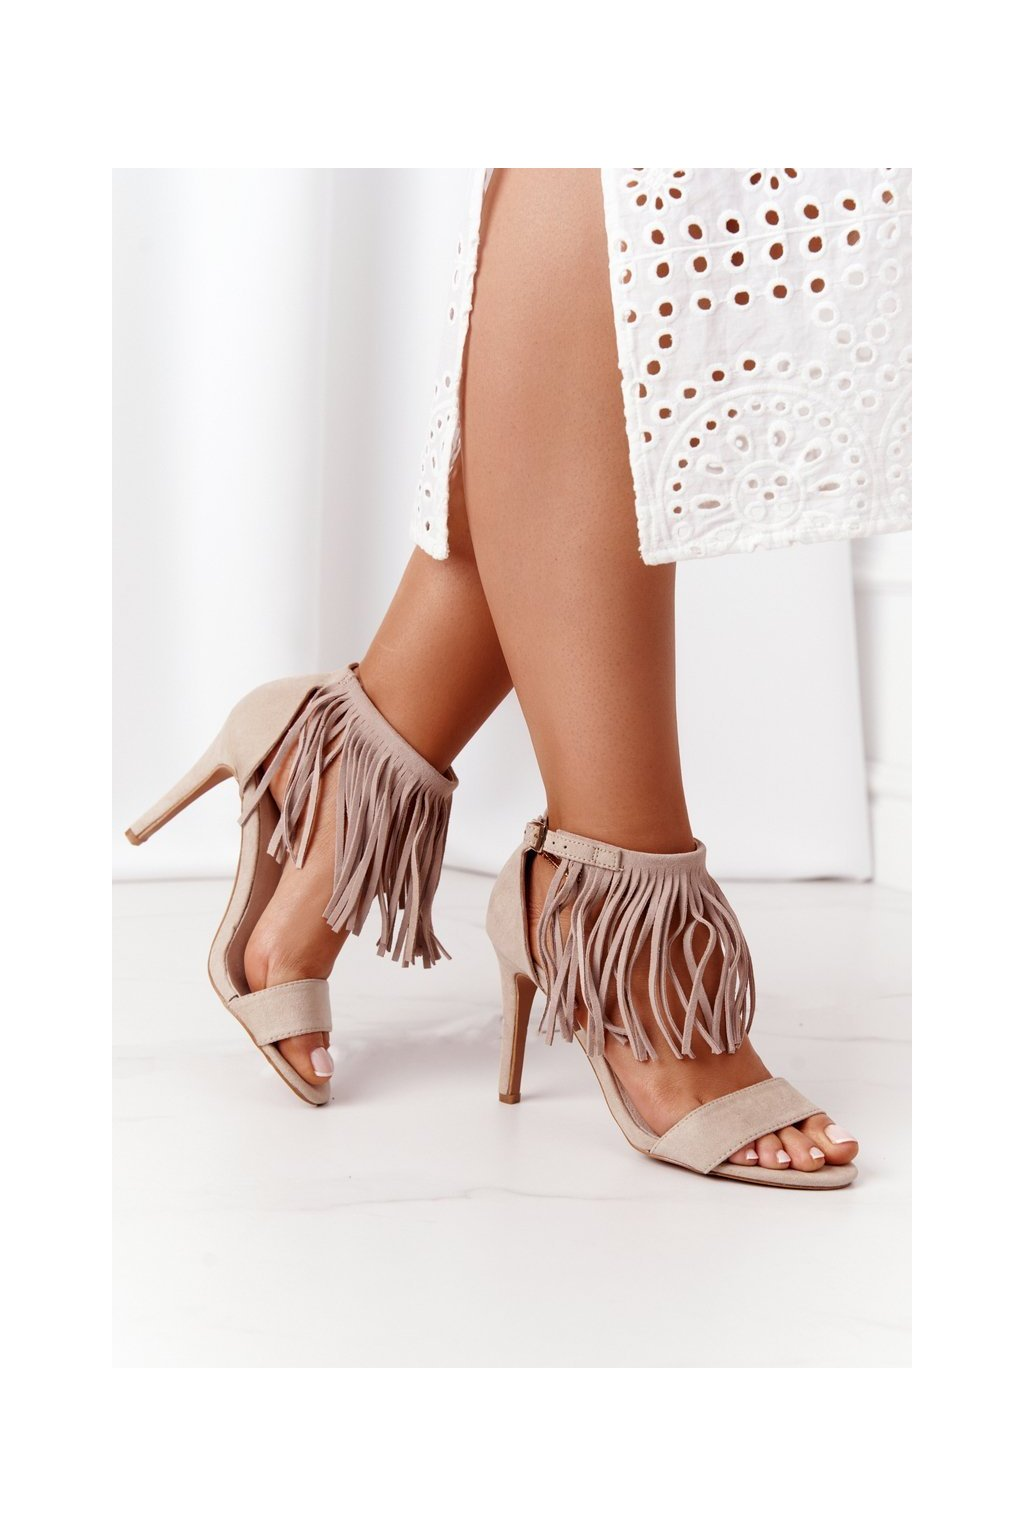 Dámske sandále farba hnedá NJSK LS39602 BEIGE